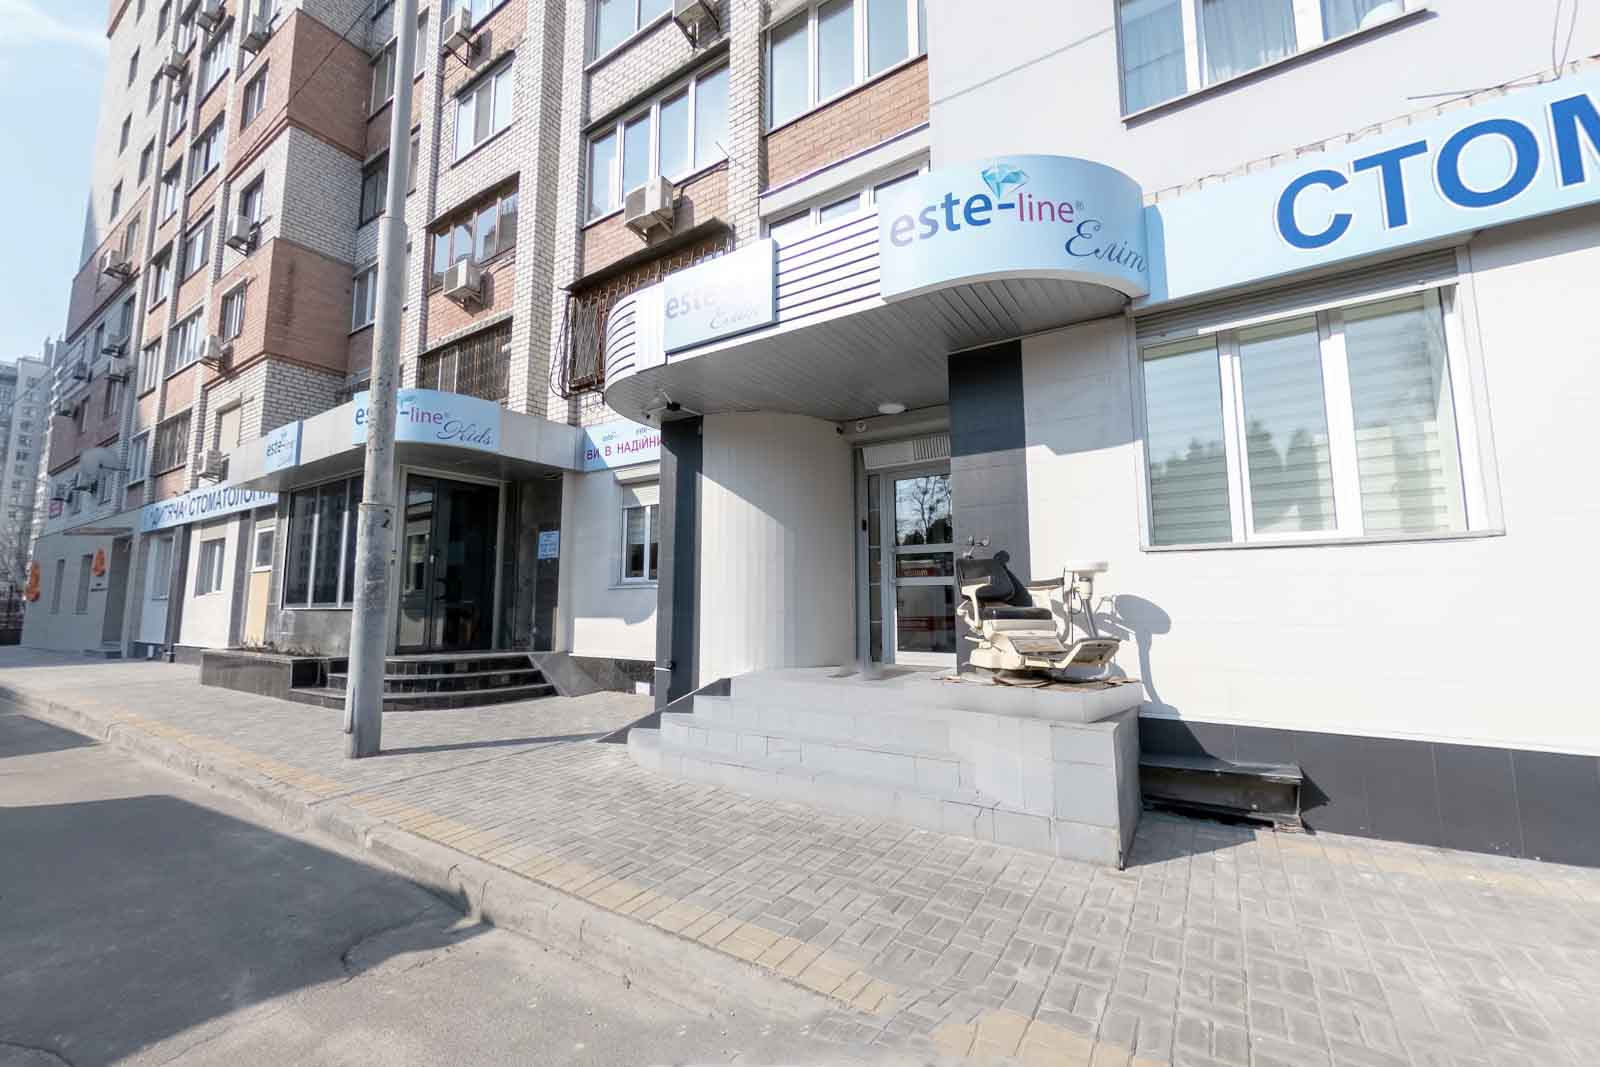 http://este-line.ua/wp-content/uploads/2021/04/stomatolog_drushbu_narodiv_kiev.jpg